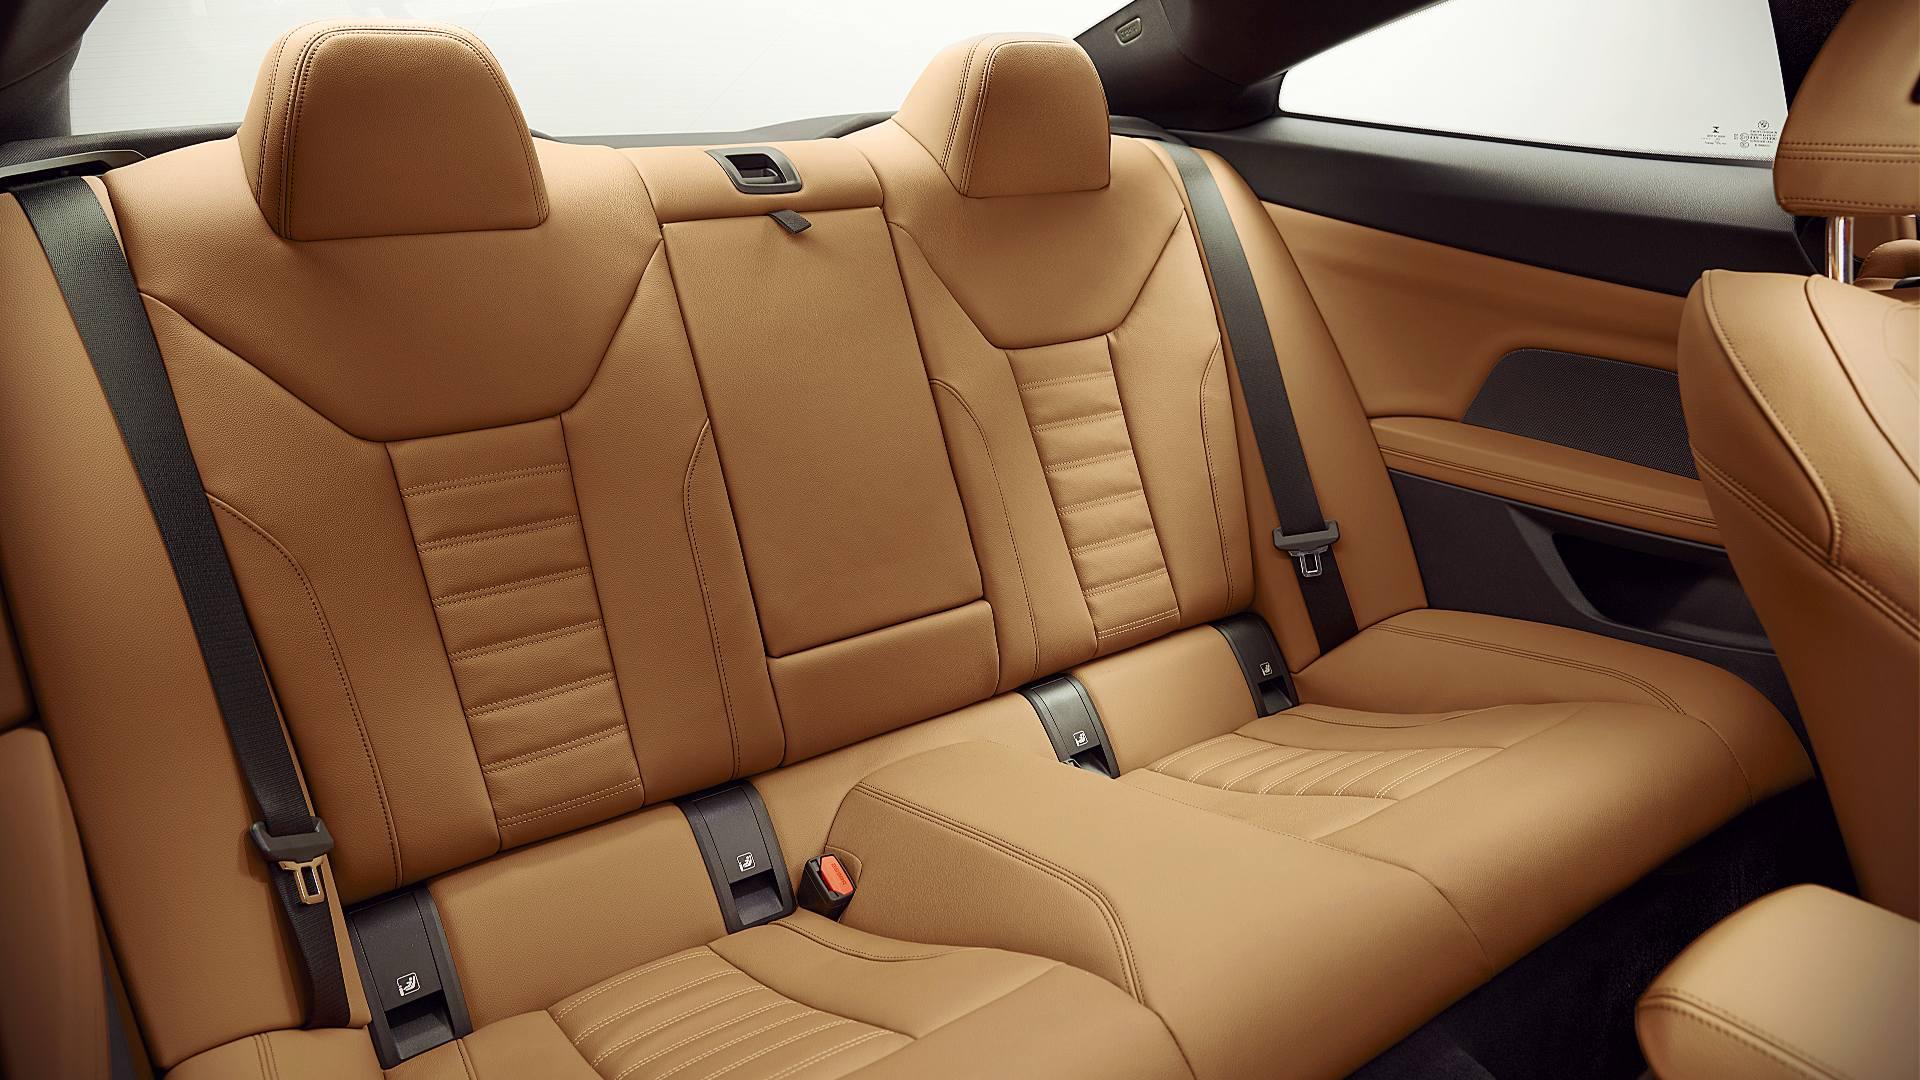 2021 BMW 4 Series Coupe Interior